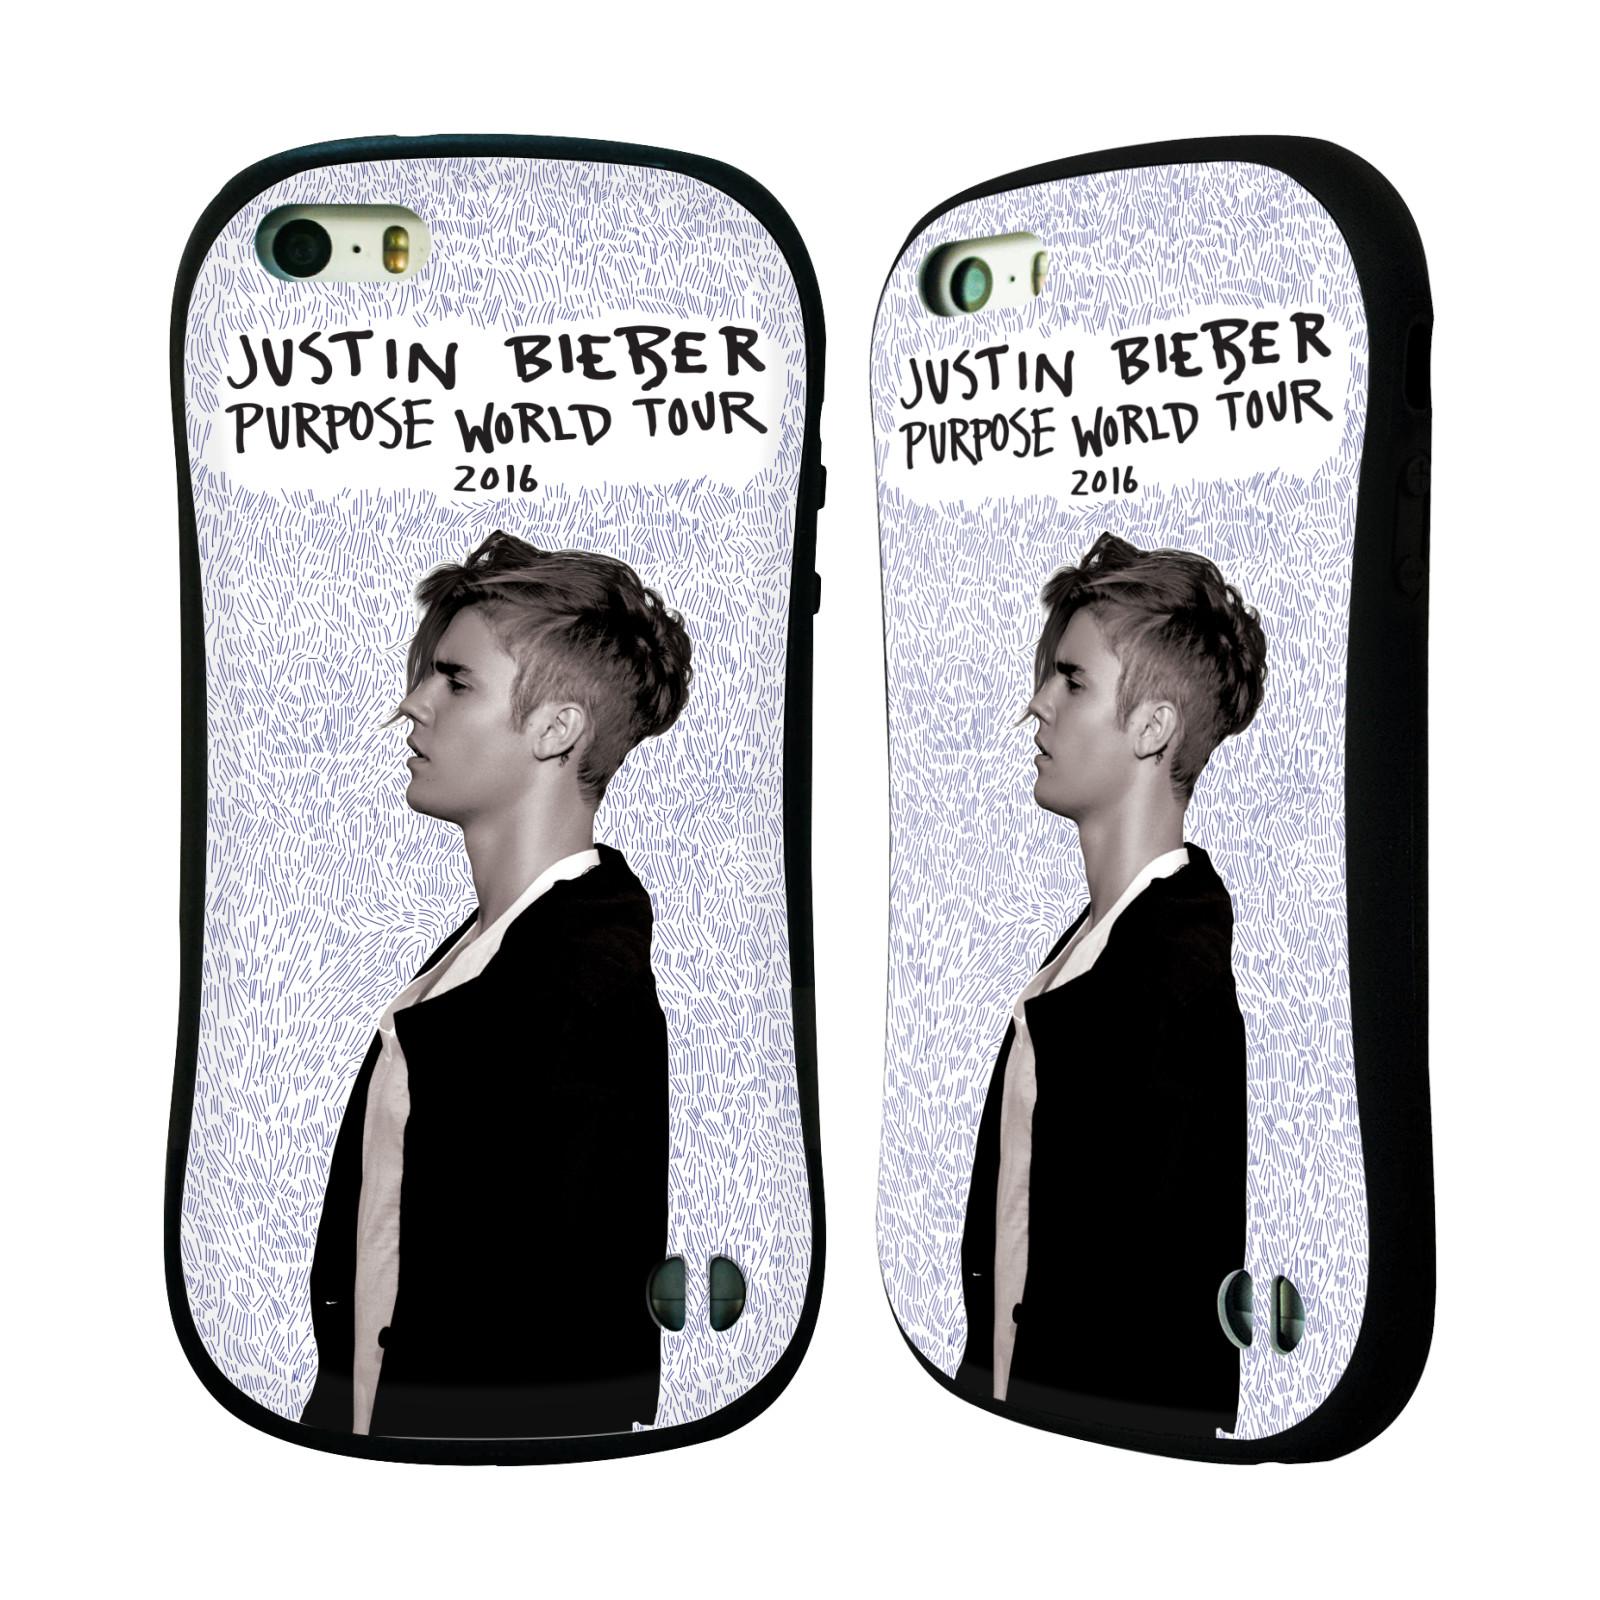 HEAD CASE silikon/plast odolný obal na mobil Apple Iphone 5 / 5S originální potisk Justin Bieber Purpose world tour